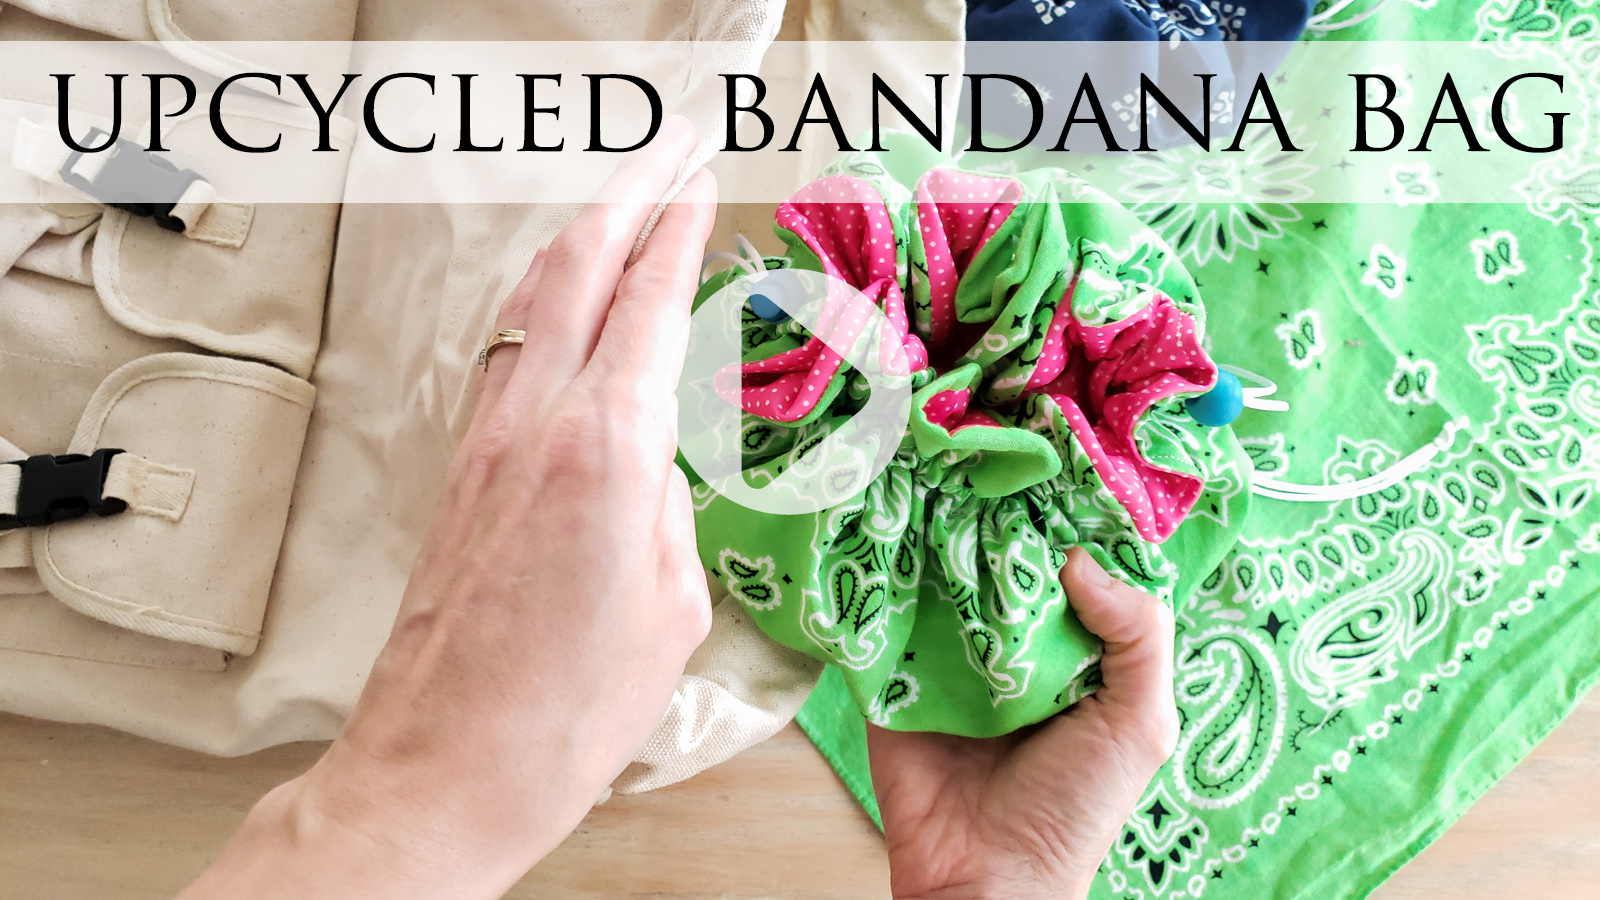 DIY Upcycled Bandana Drawstring Bag Tutorial by Larissa of Prodigal Pieces | prodigalpieces.com